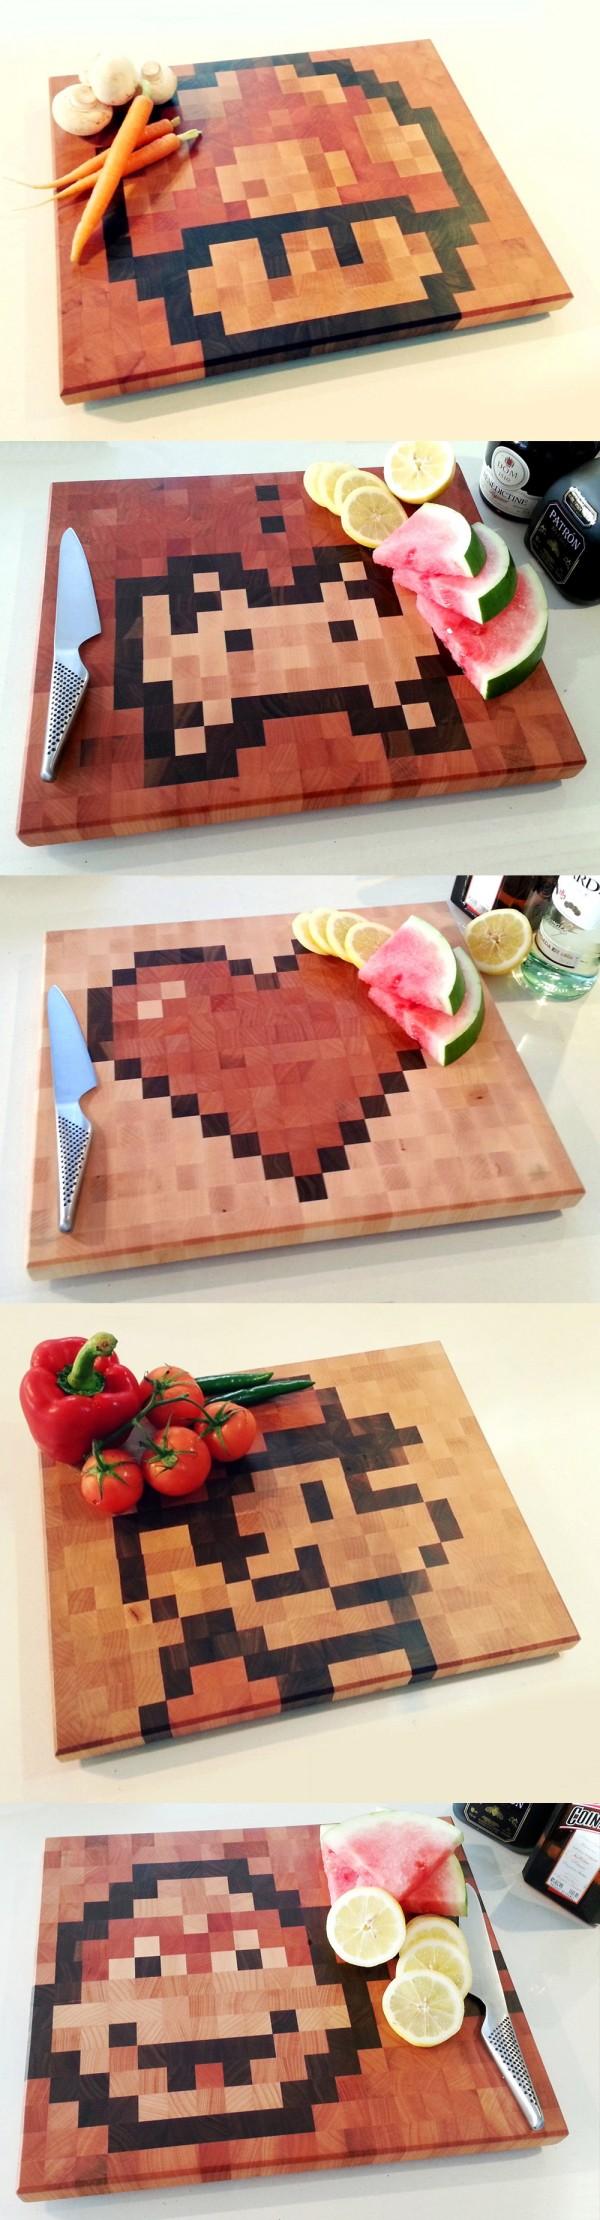 Pixeliza tu cocina